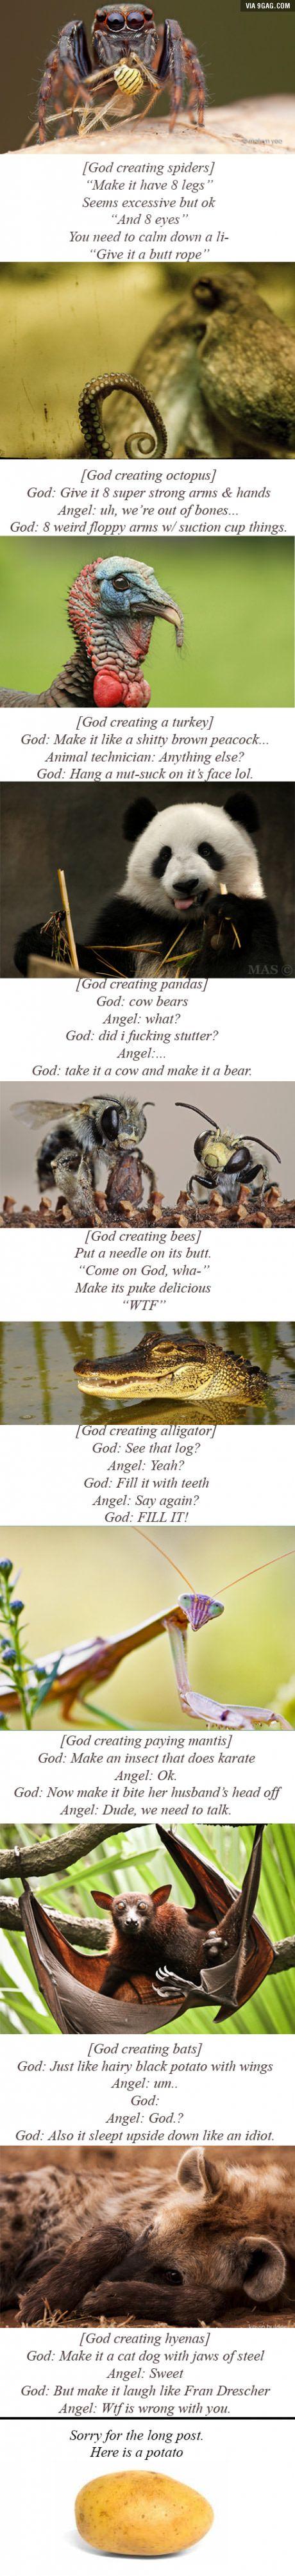 God creating animals.